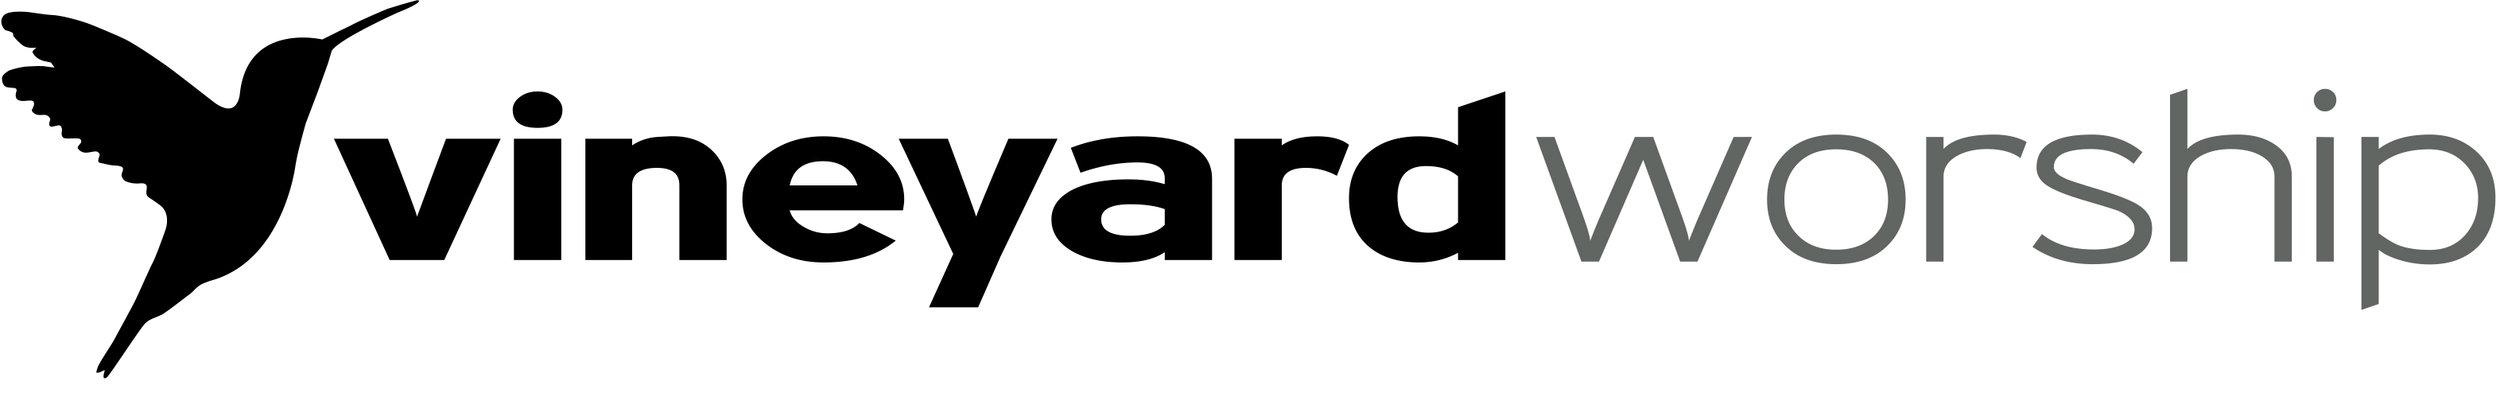 Vineyard-Logo-Black-small.png